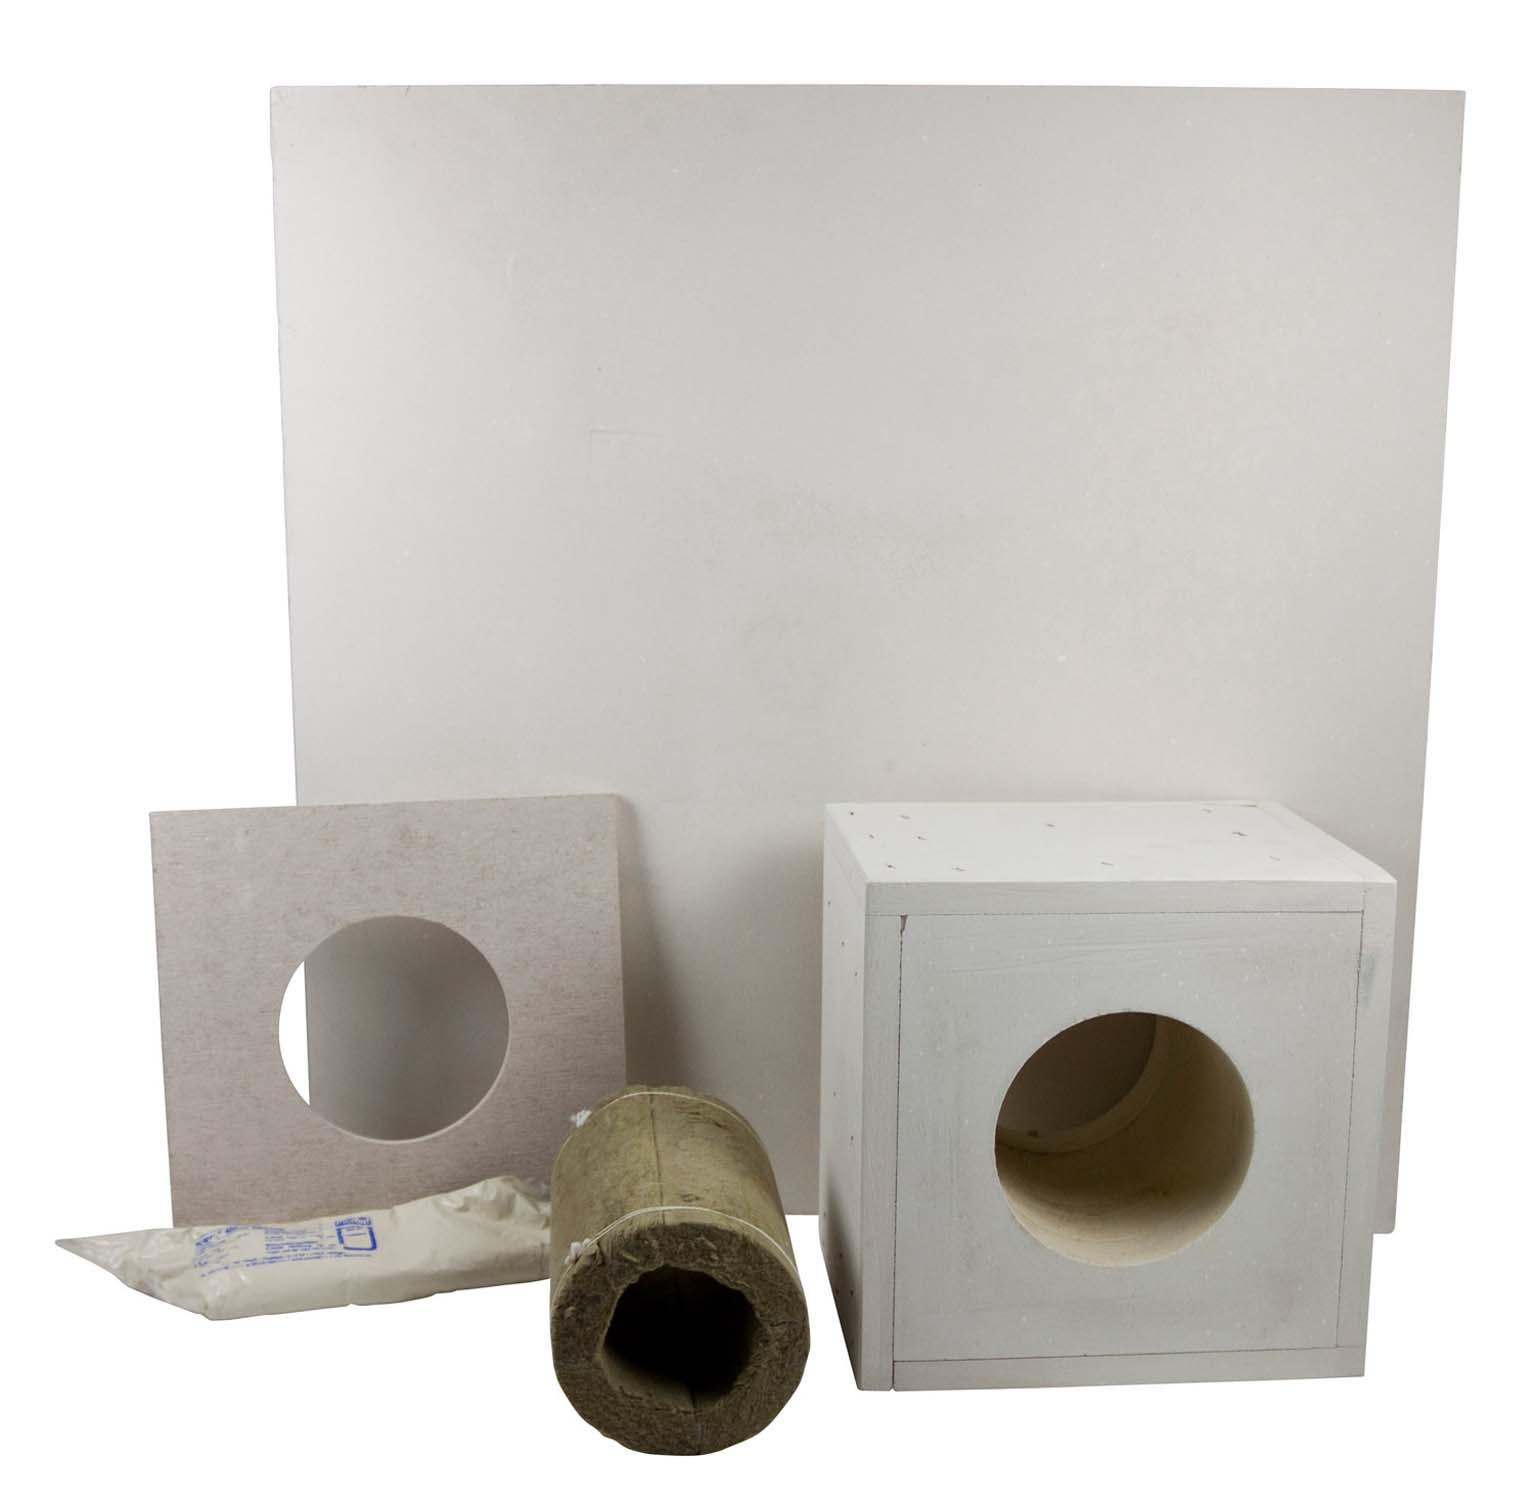 wanddurchf hrung raab f90 bis wandst rke 240 mm g nstig kaufen. Black Bedroom Furniture Sets. Home Design Ideas